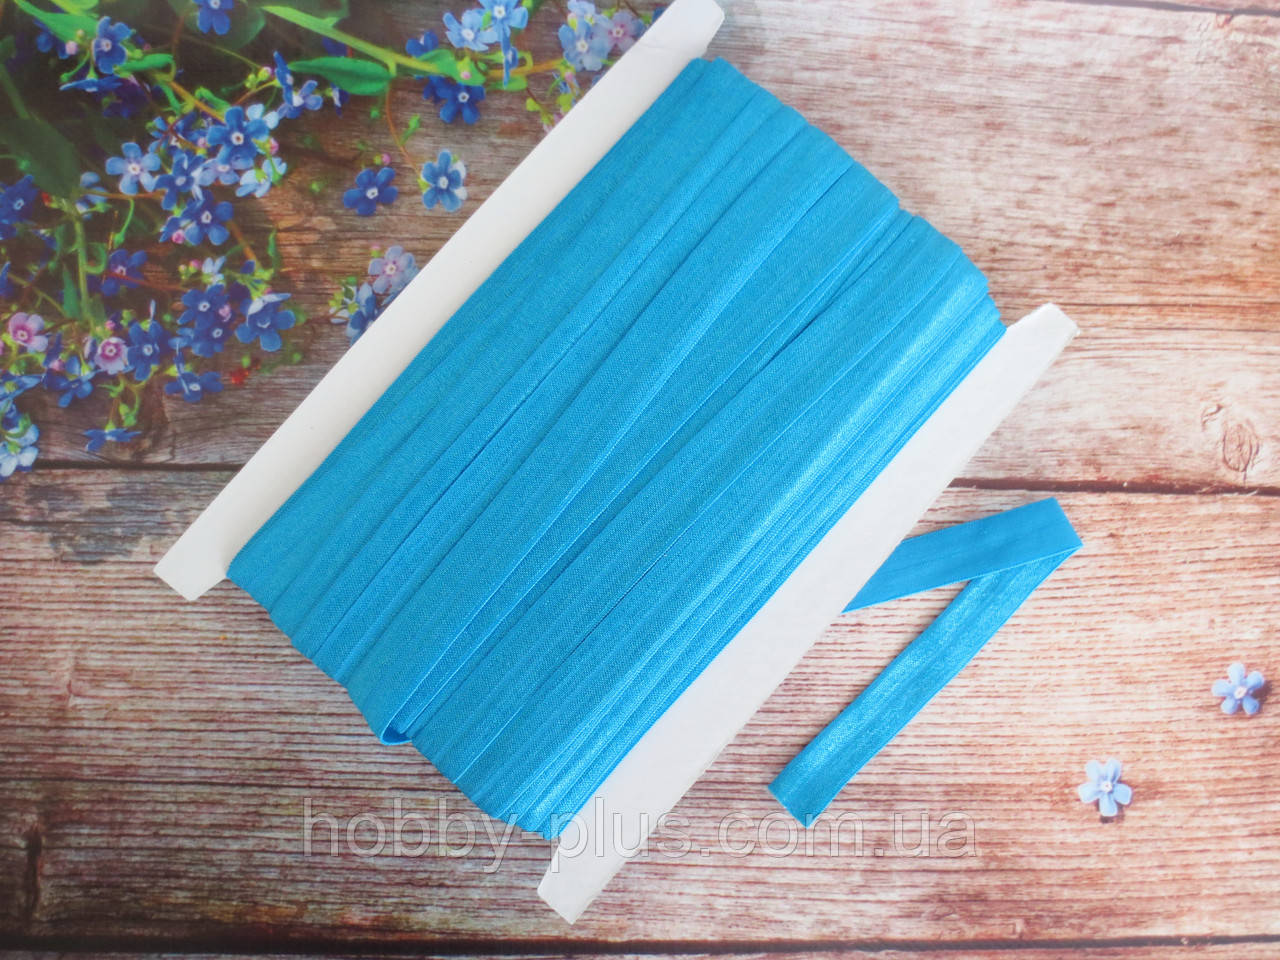 Бейка-резинка для повязок, цвет небесно-голубой, 15 мм